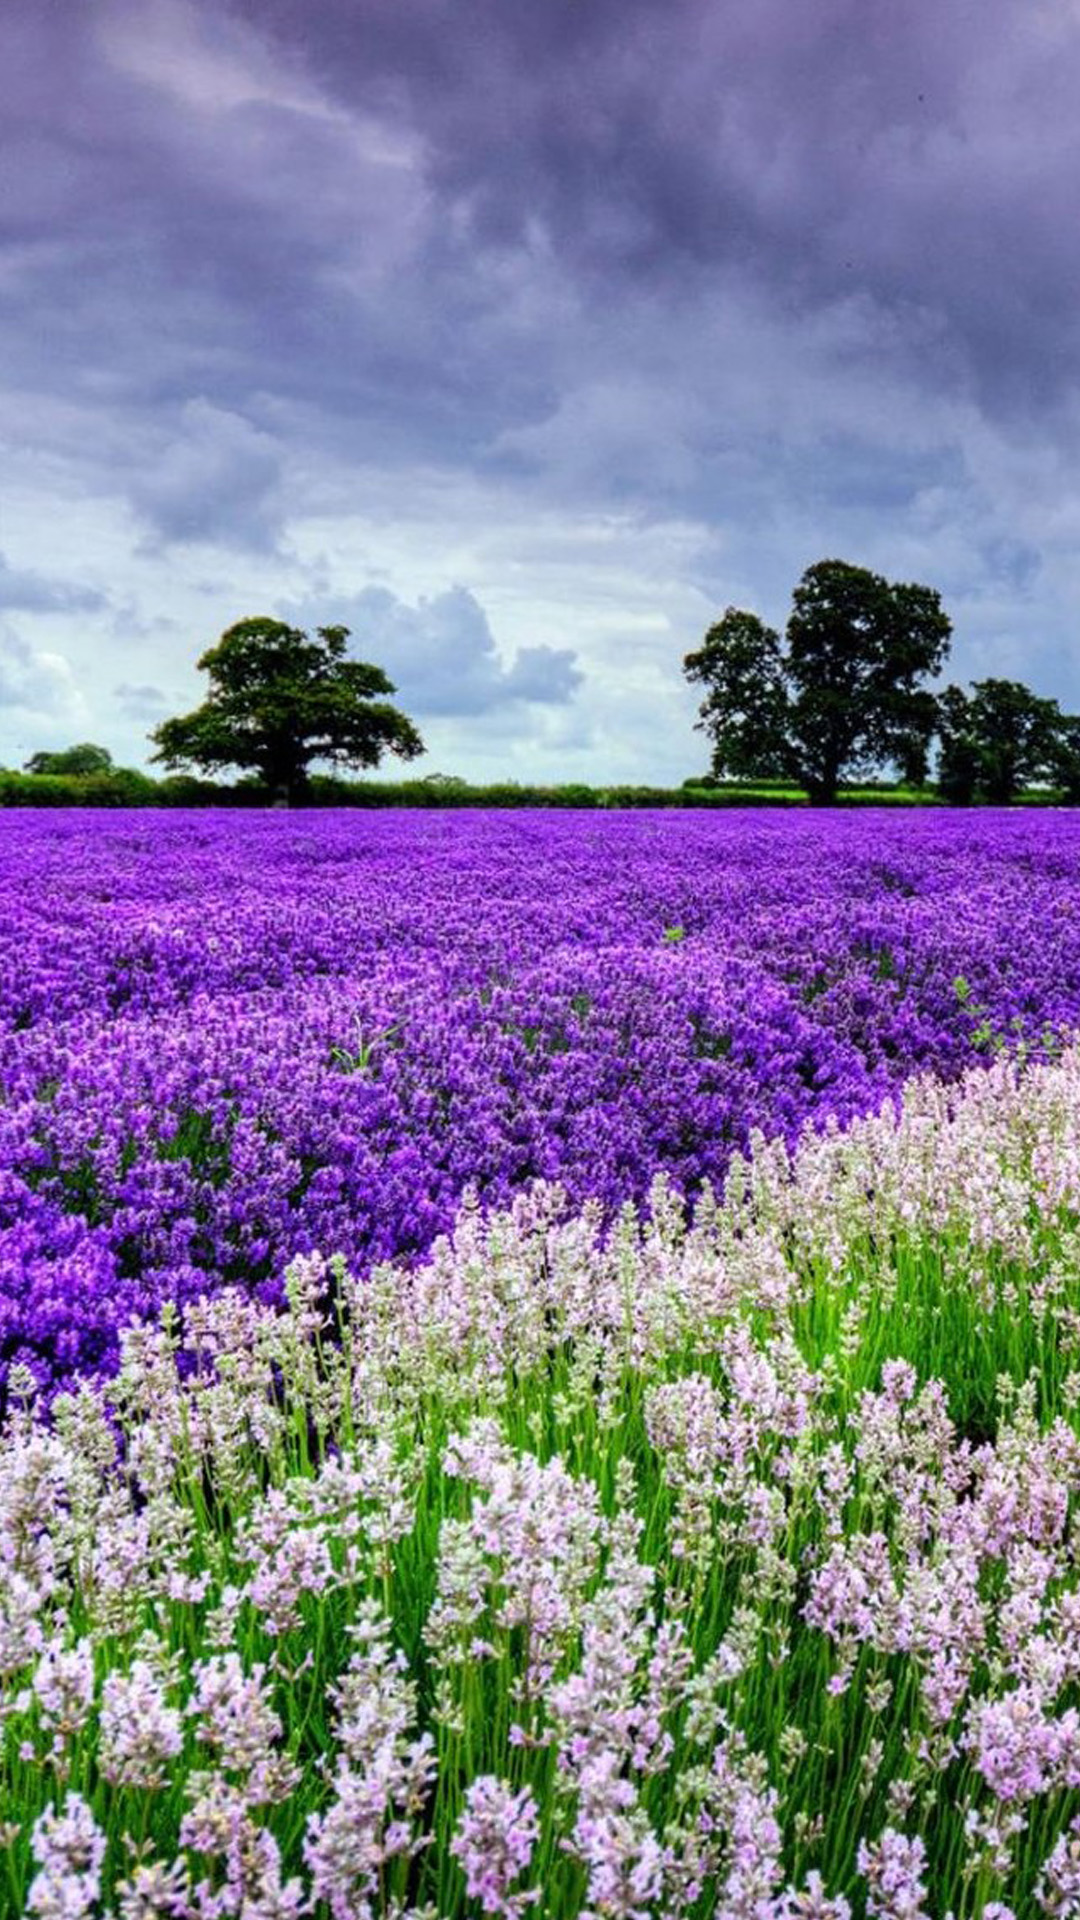 Flower Garden Wallpapers For Phone 1080x1920 Download Hd Wallpaper Wallpapertip